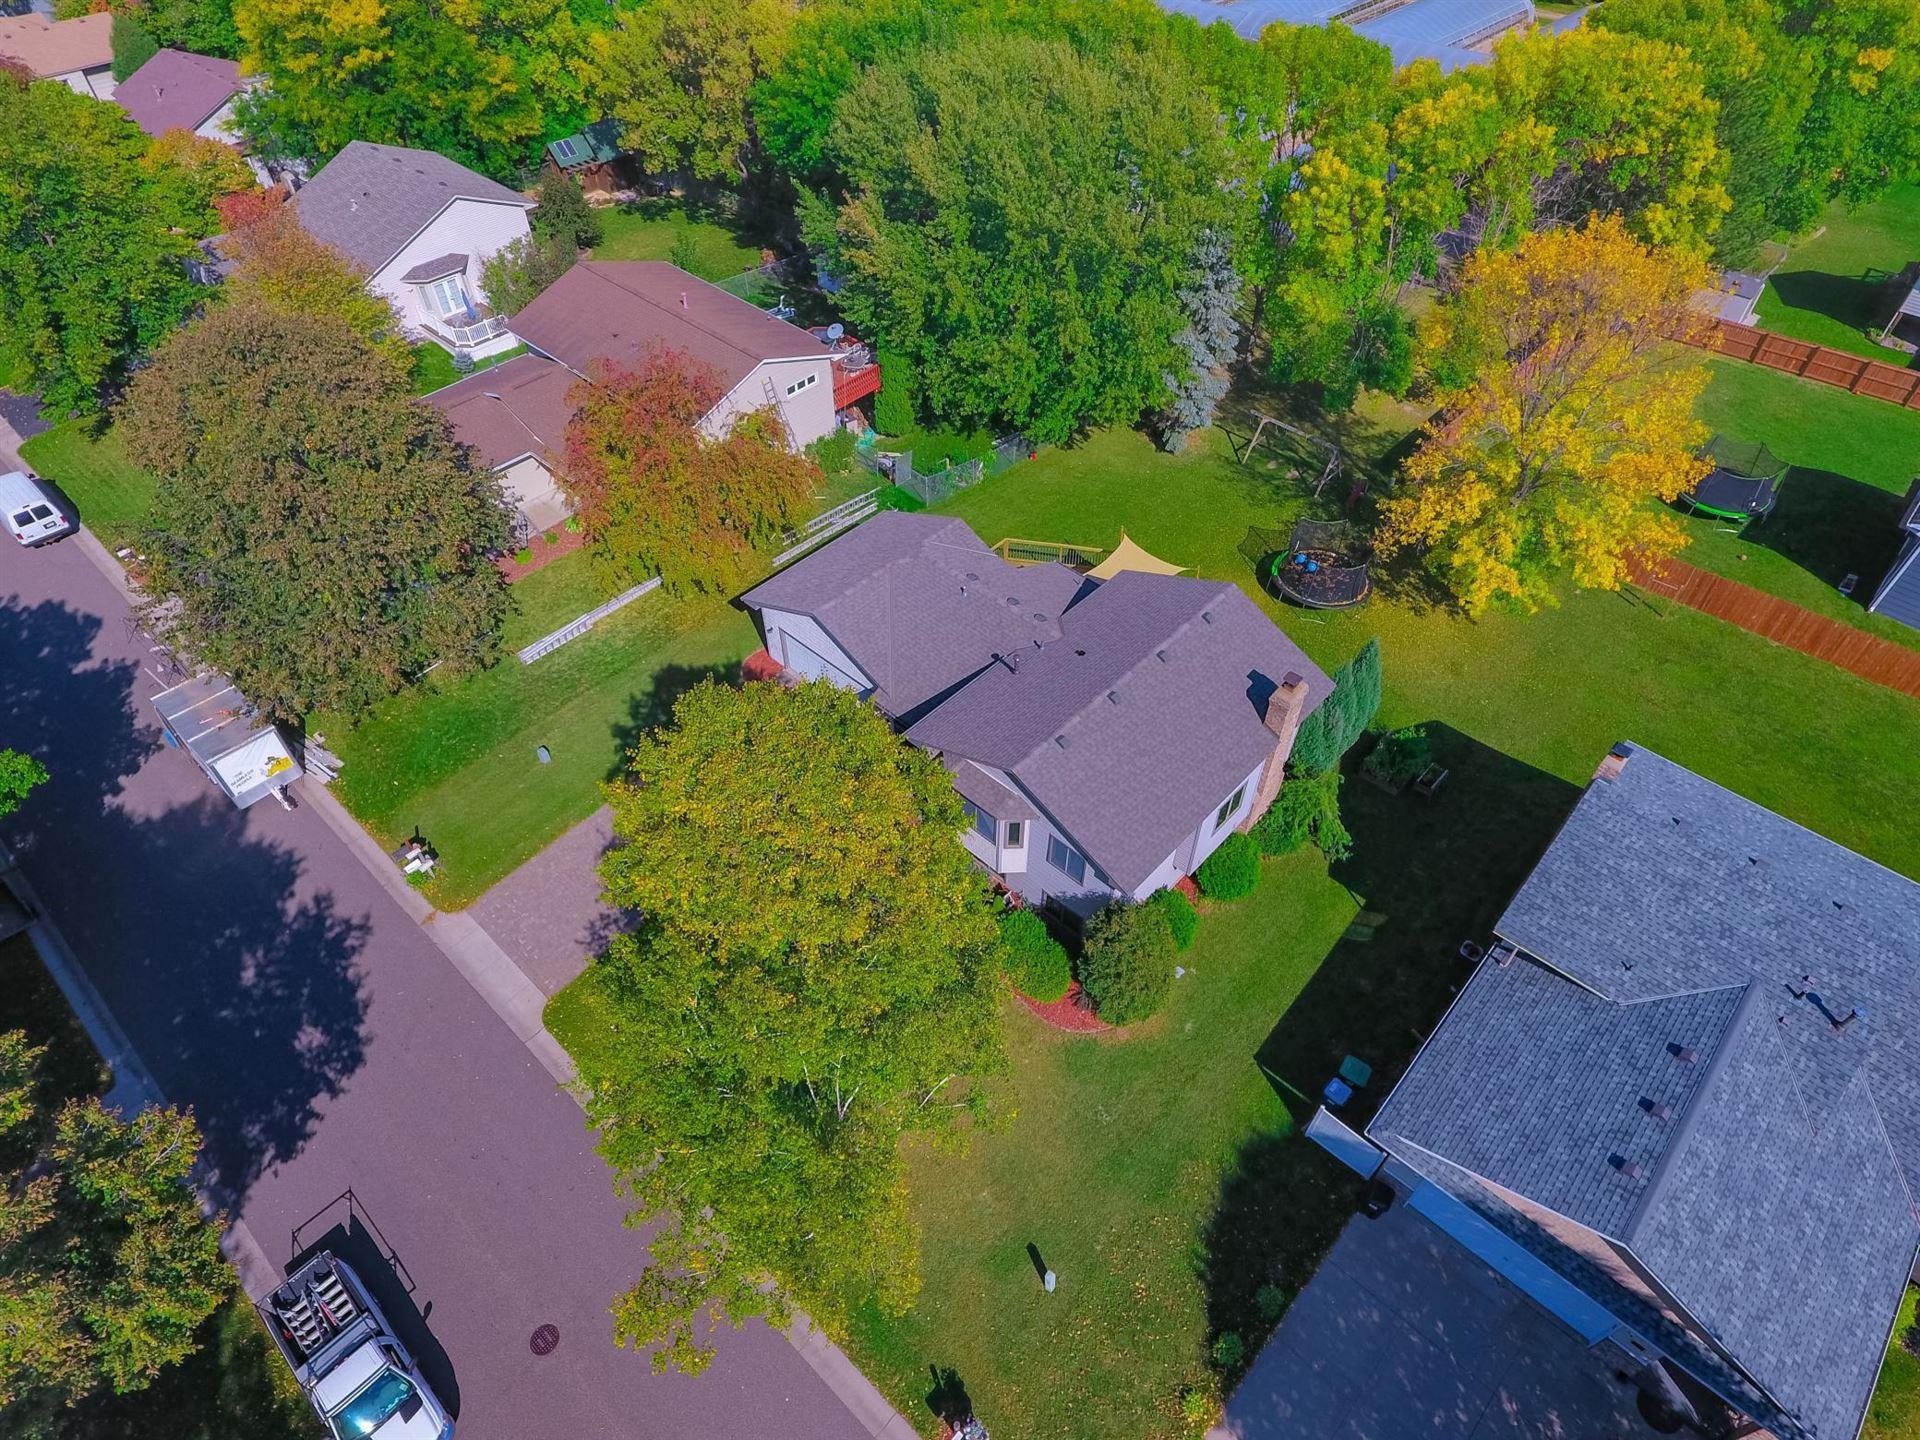 Photo of 9122 Rosewood Lane N, Maple Grove, MN 55369 (MLS # 6105605)